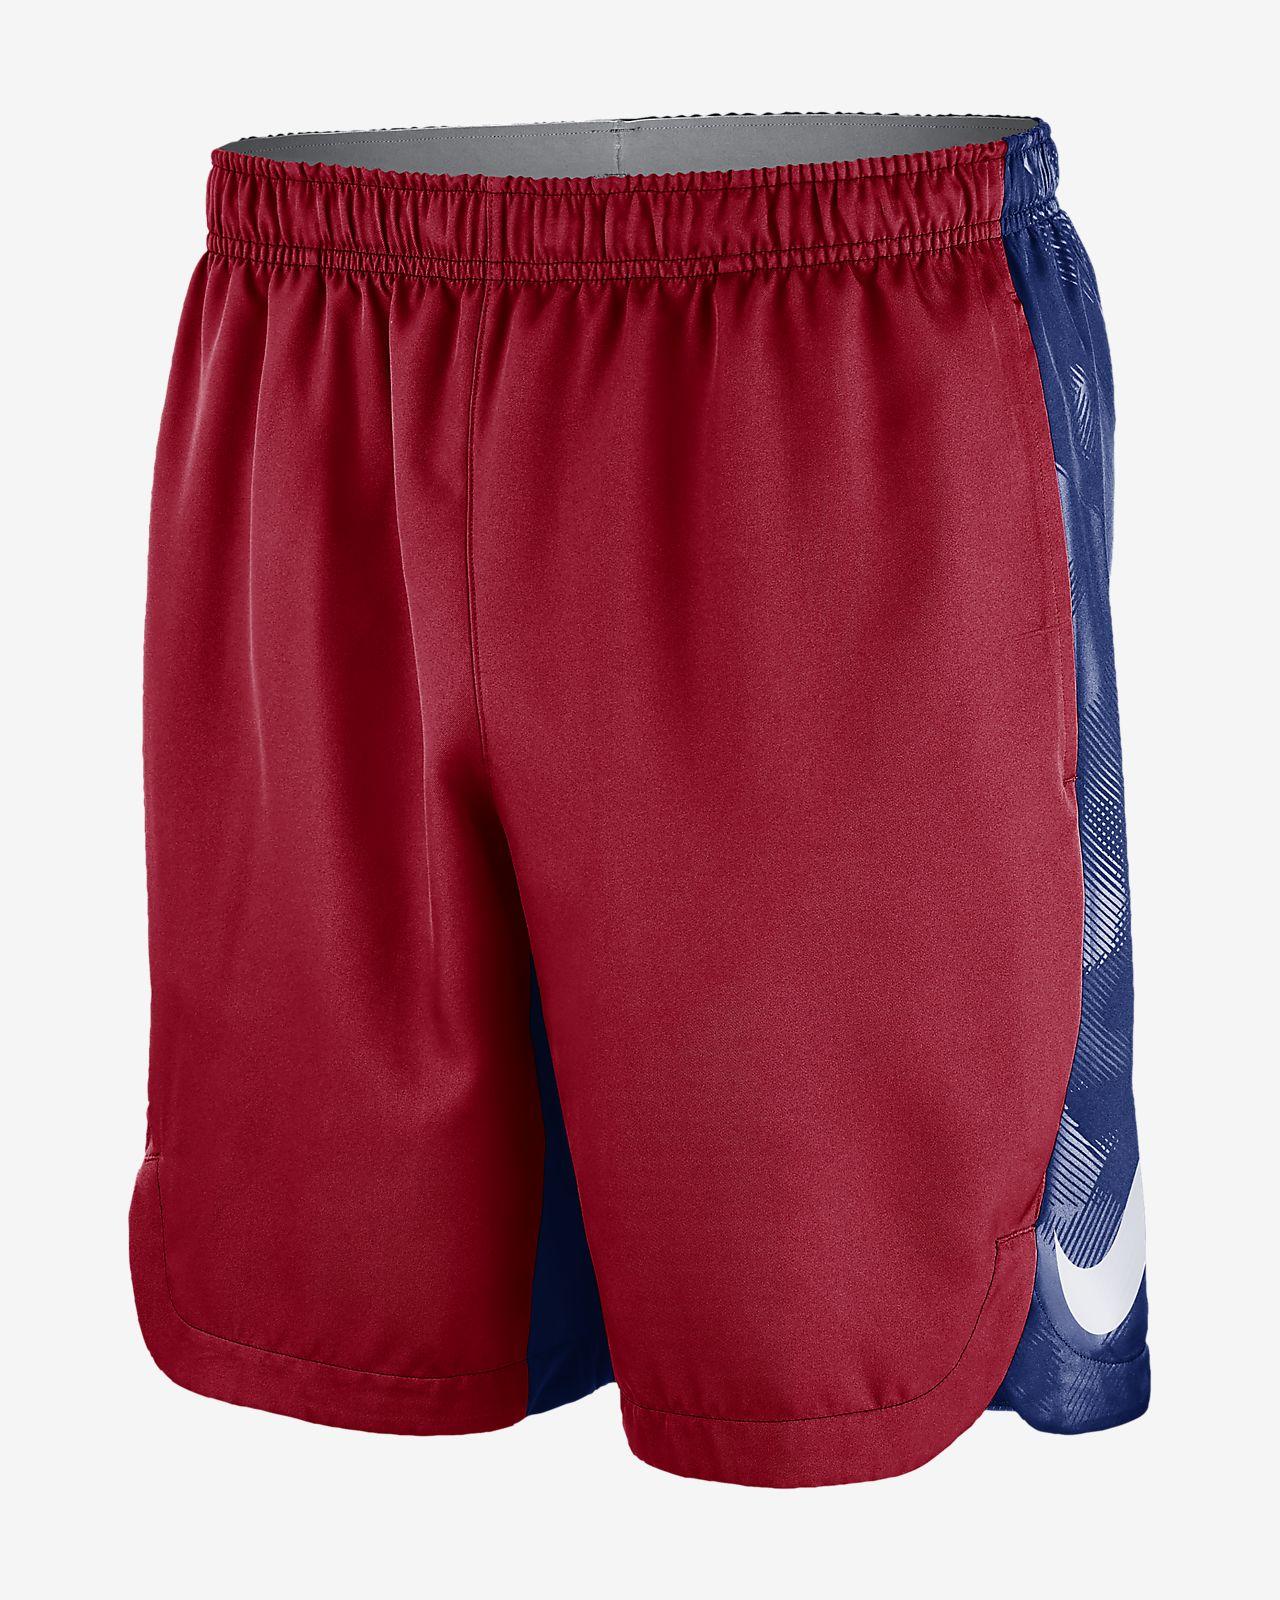 Nike Dri-FIT (MLB Cubs) Men's Shorts